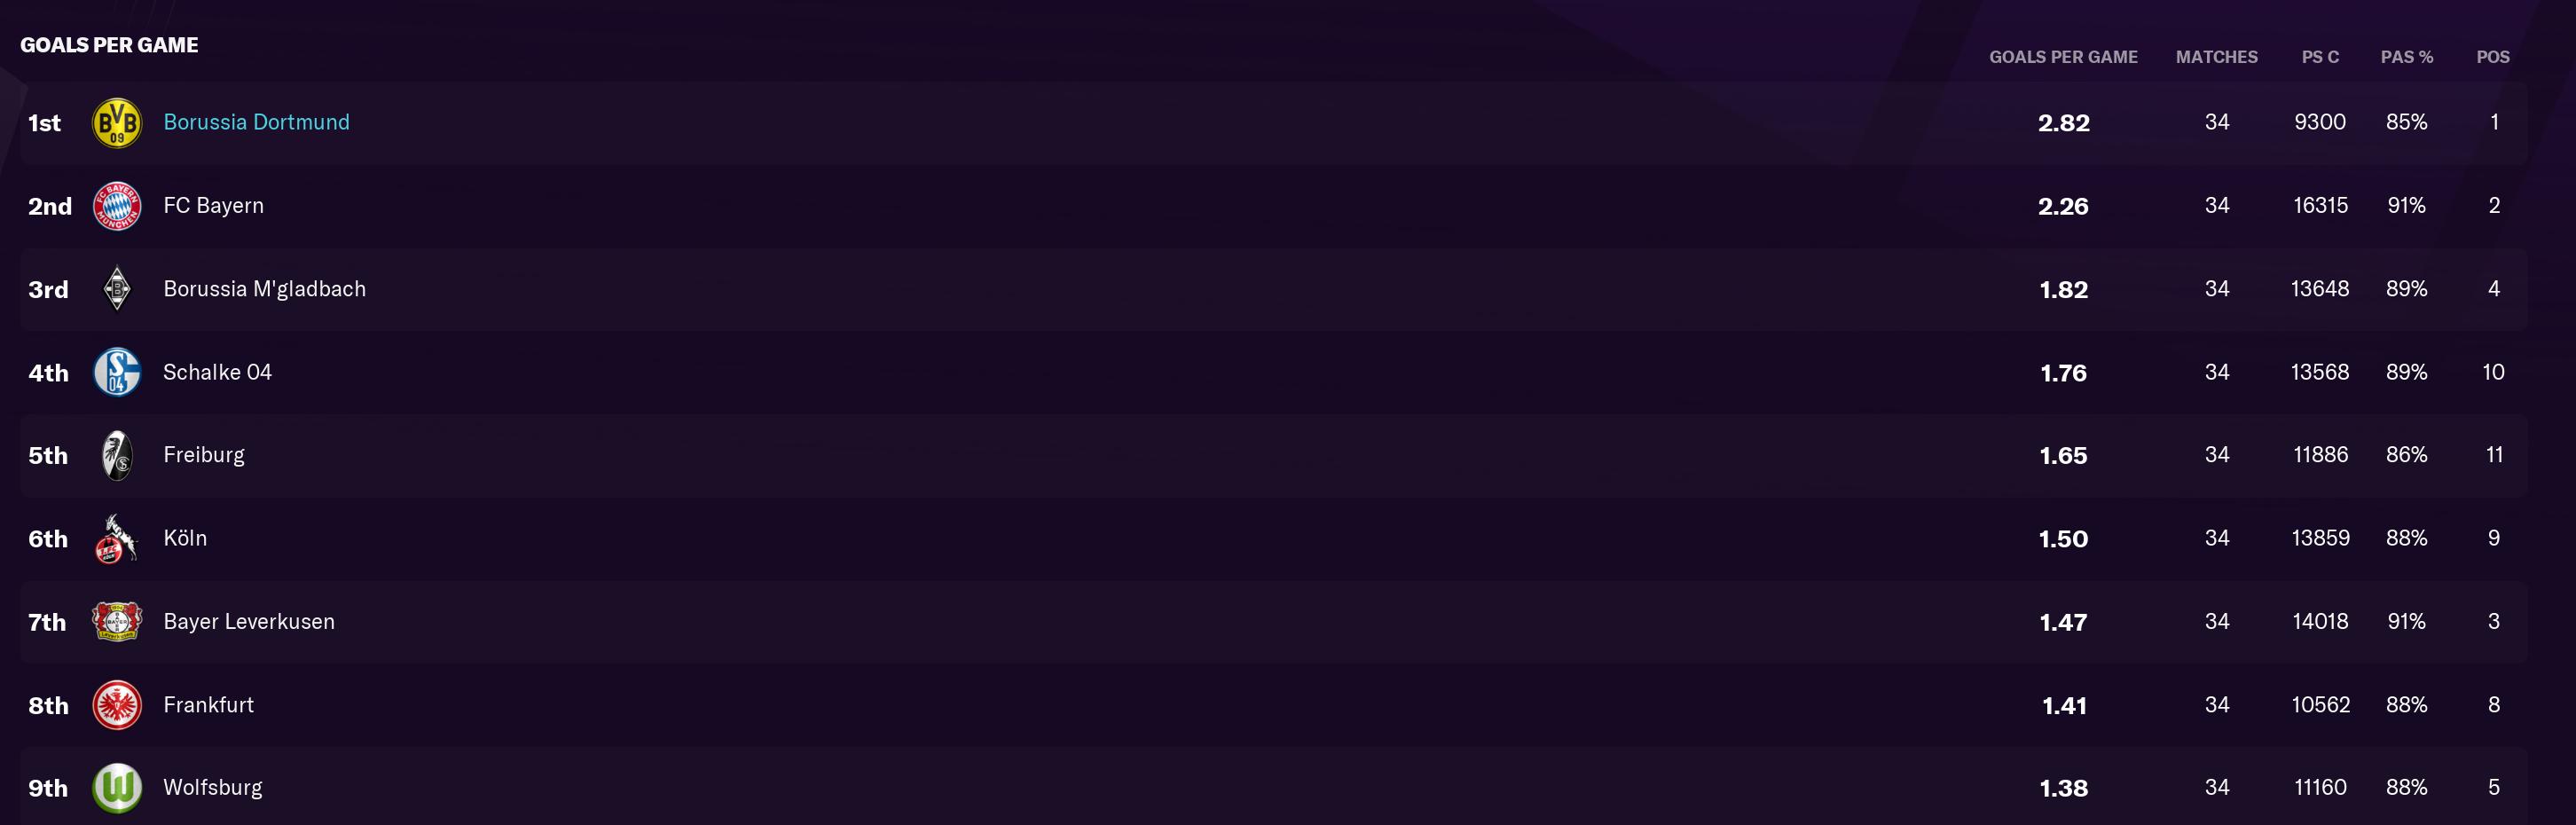 14 Dortmund 2.82 GPG Bundesliga.PNG